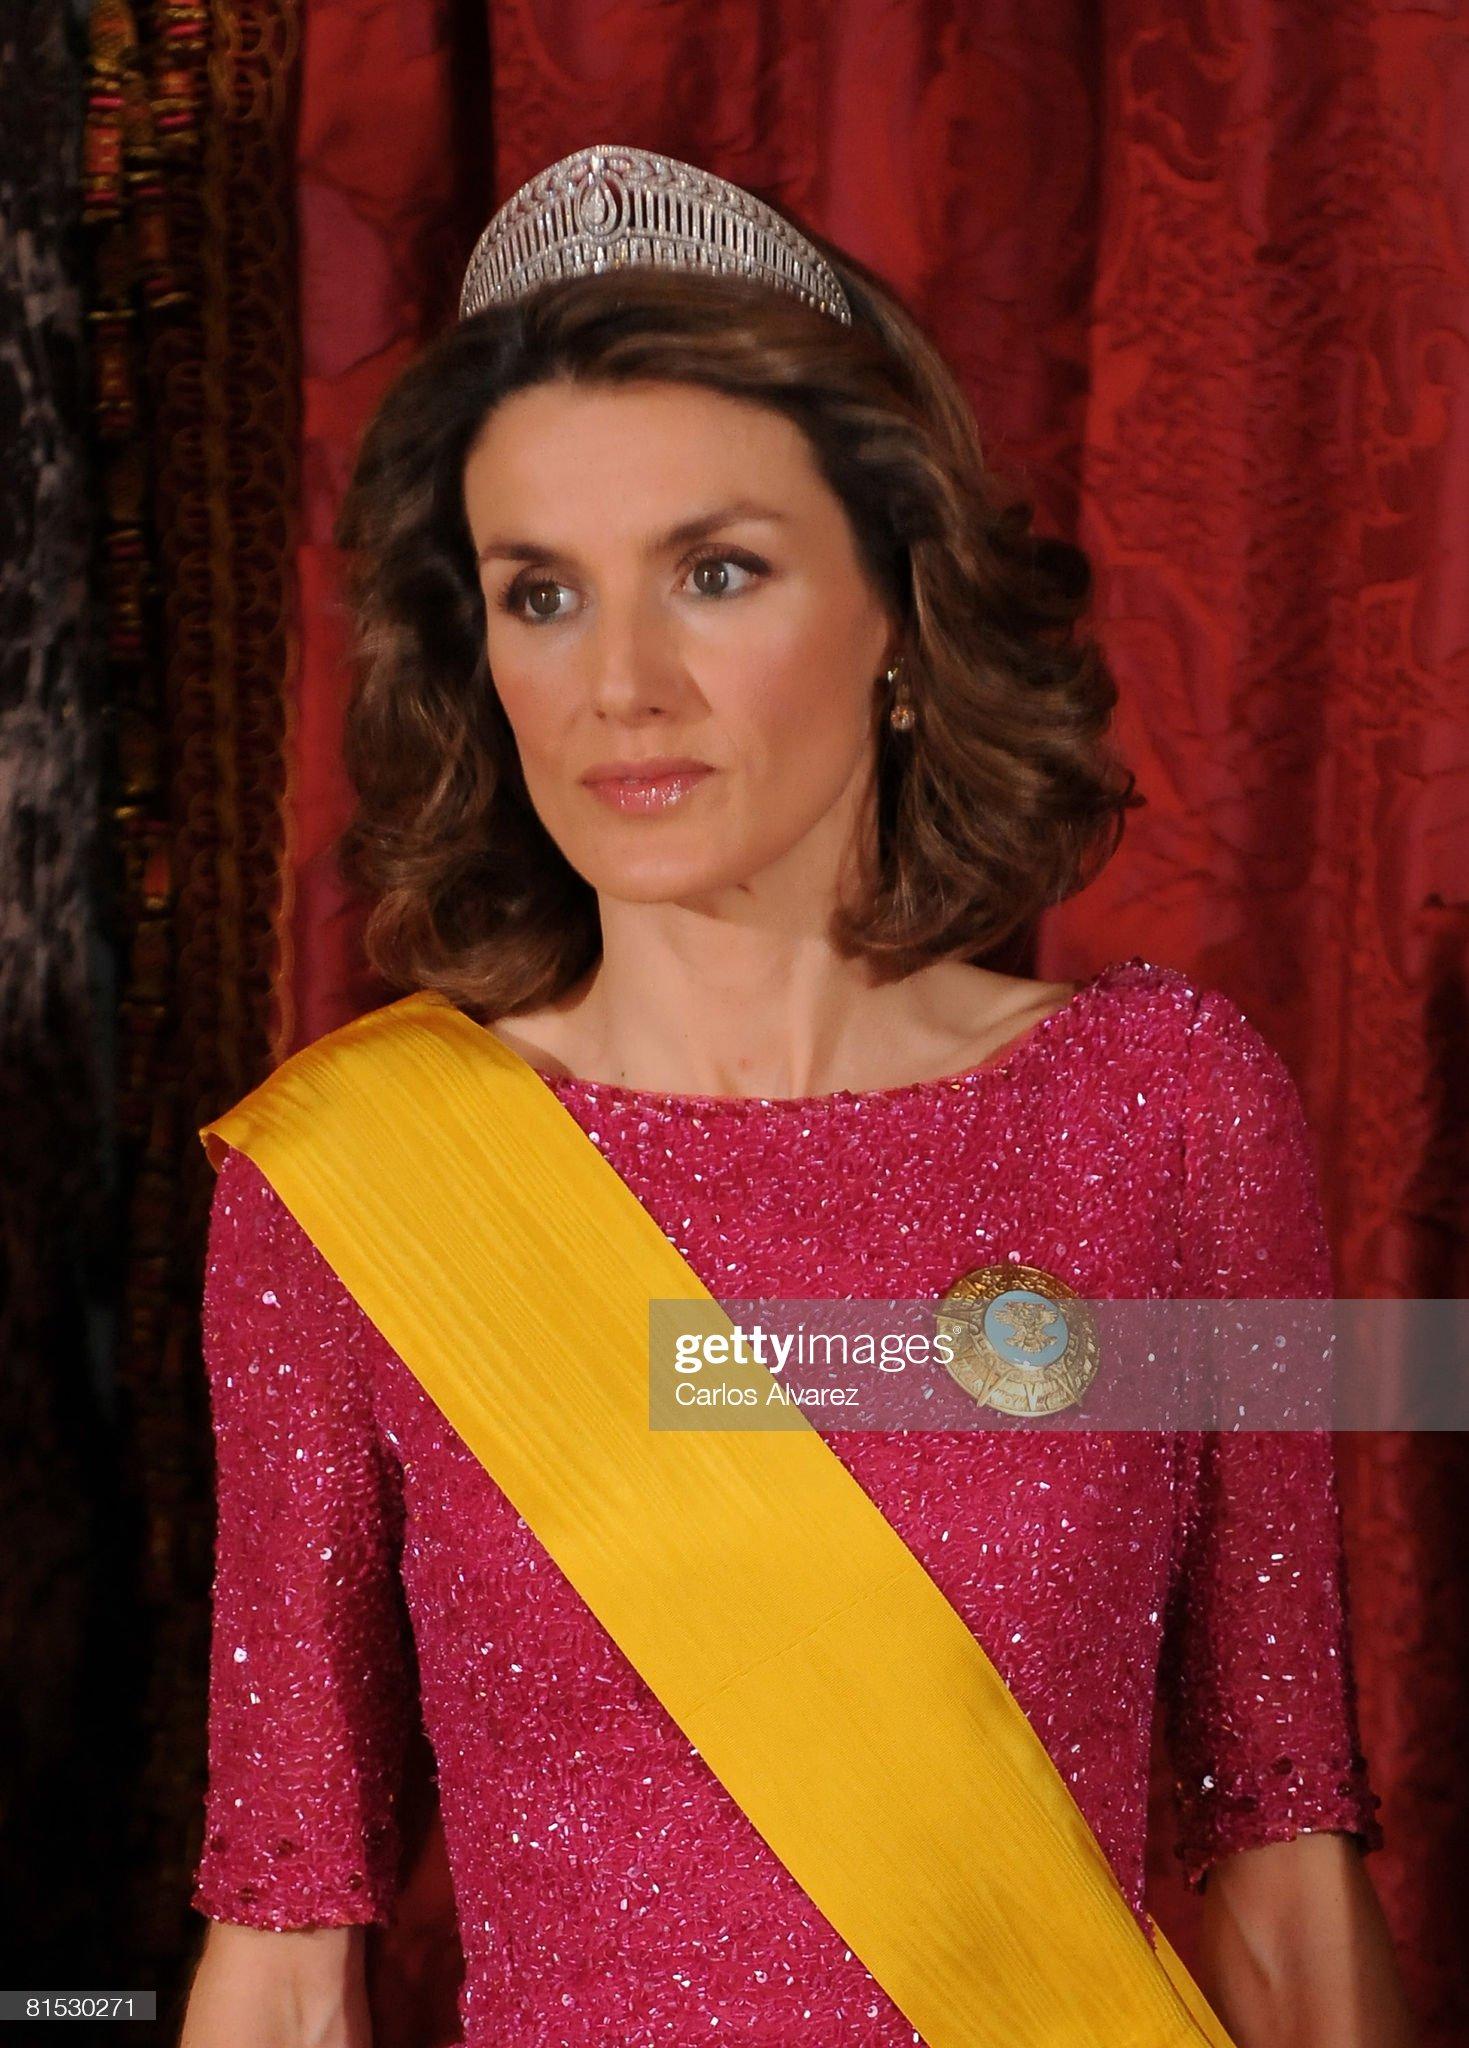 Вечерние наряды Королевы Летиции Spanish Royals Host Gala Dinner Honouring Mexican President : News Photo